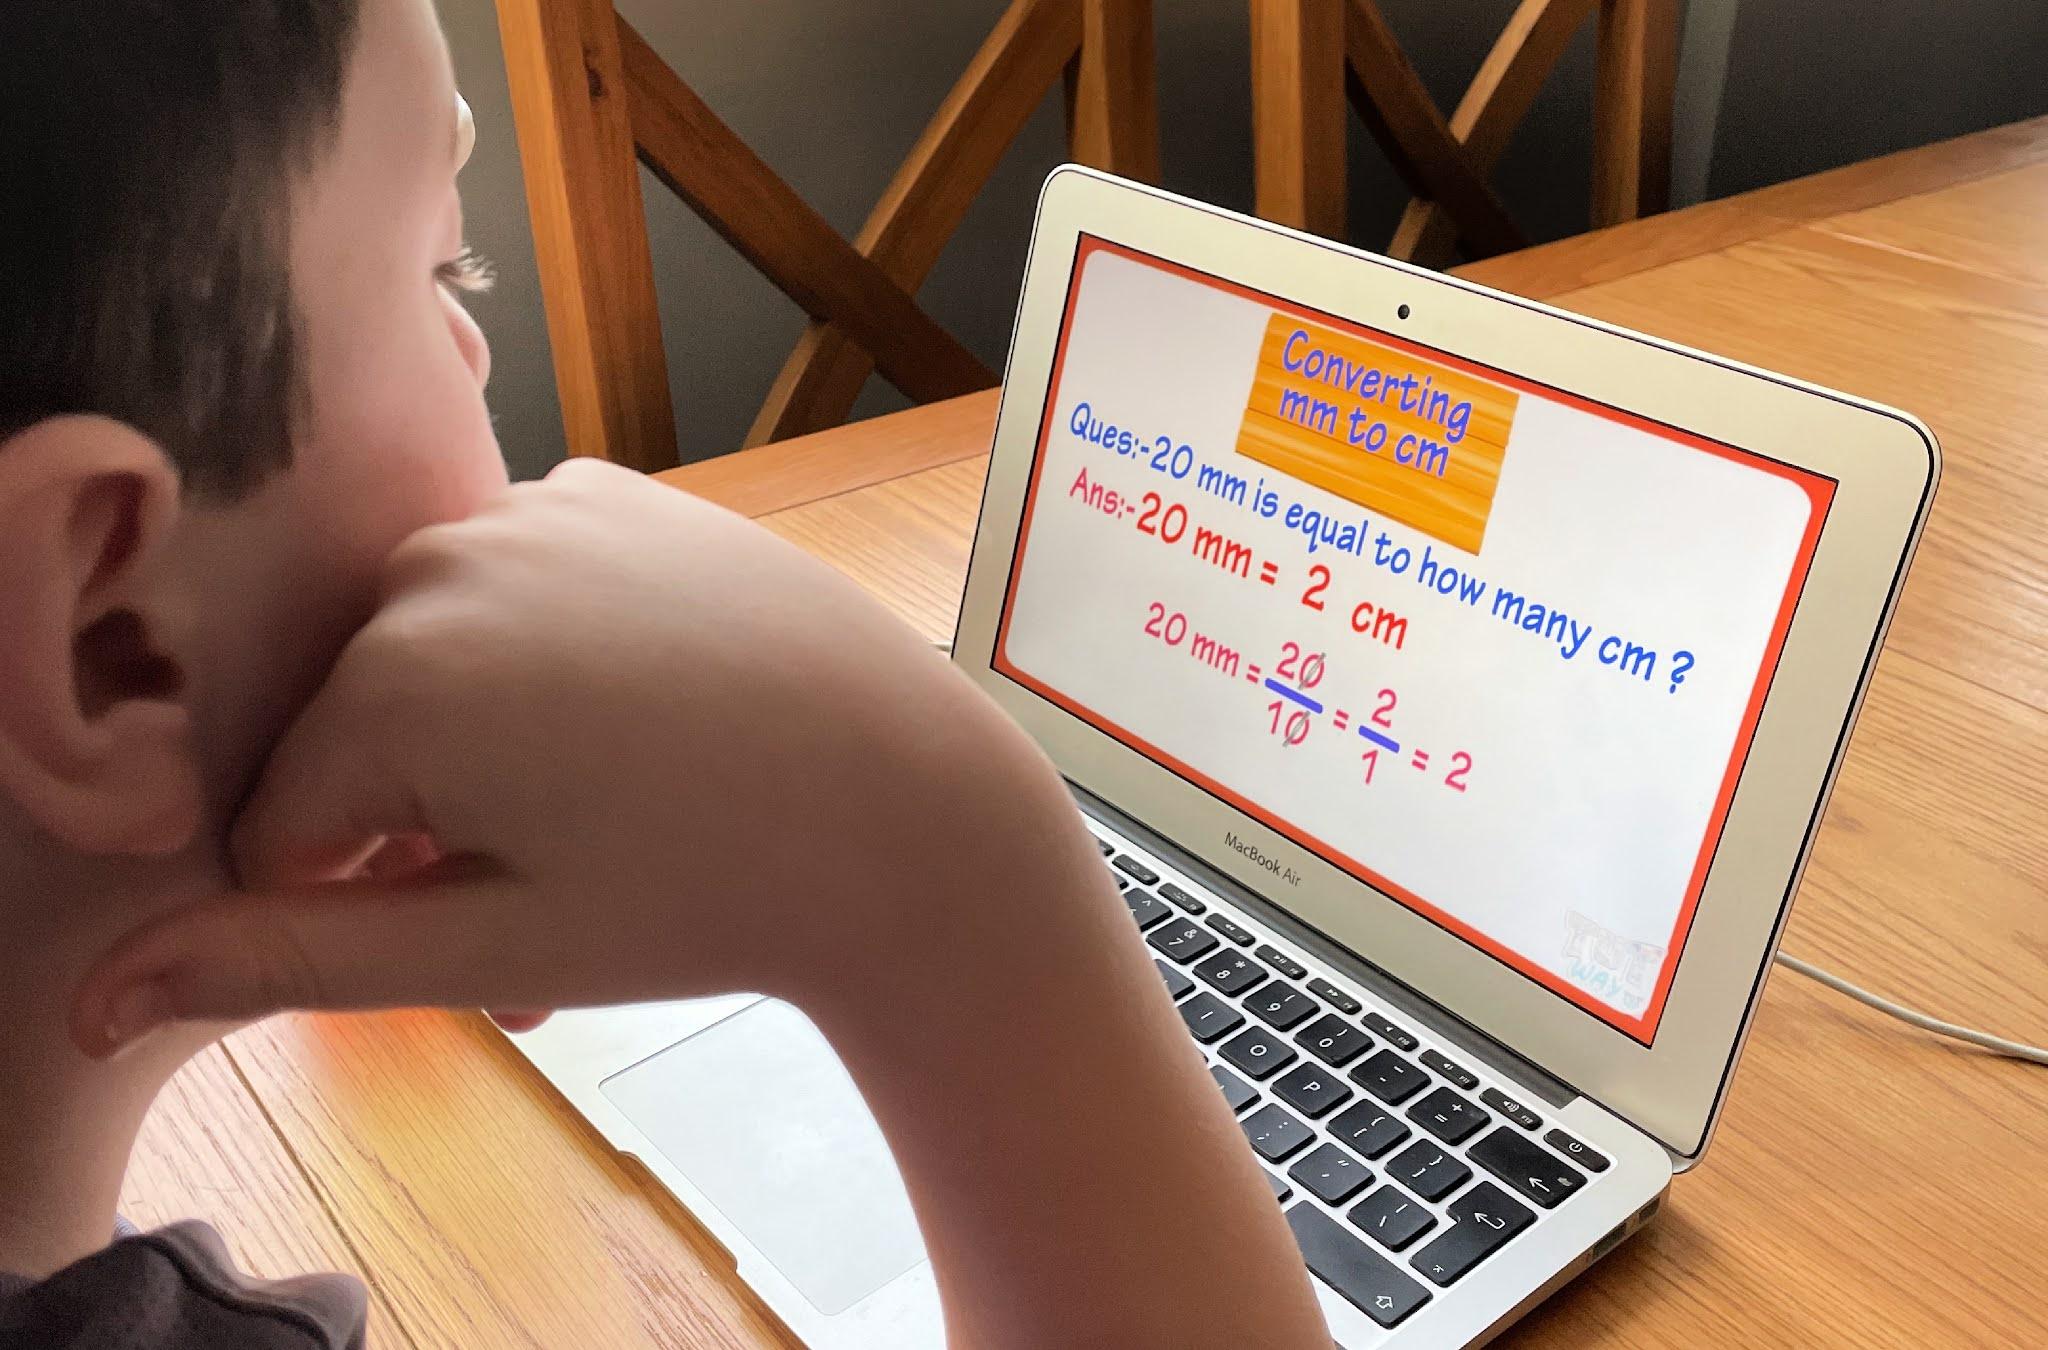 boy looking at a computer screen